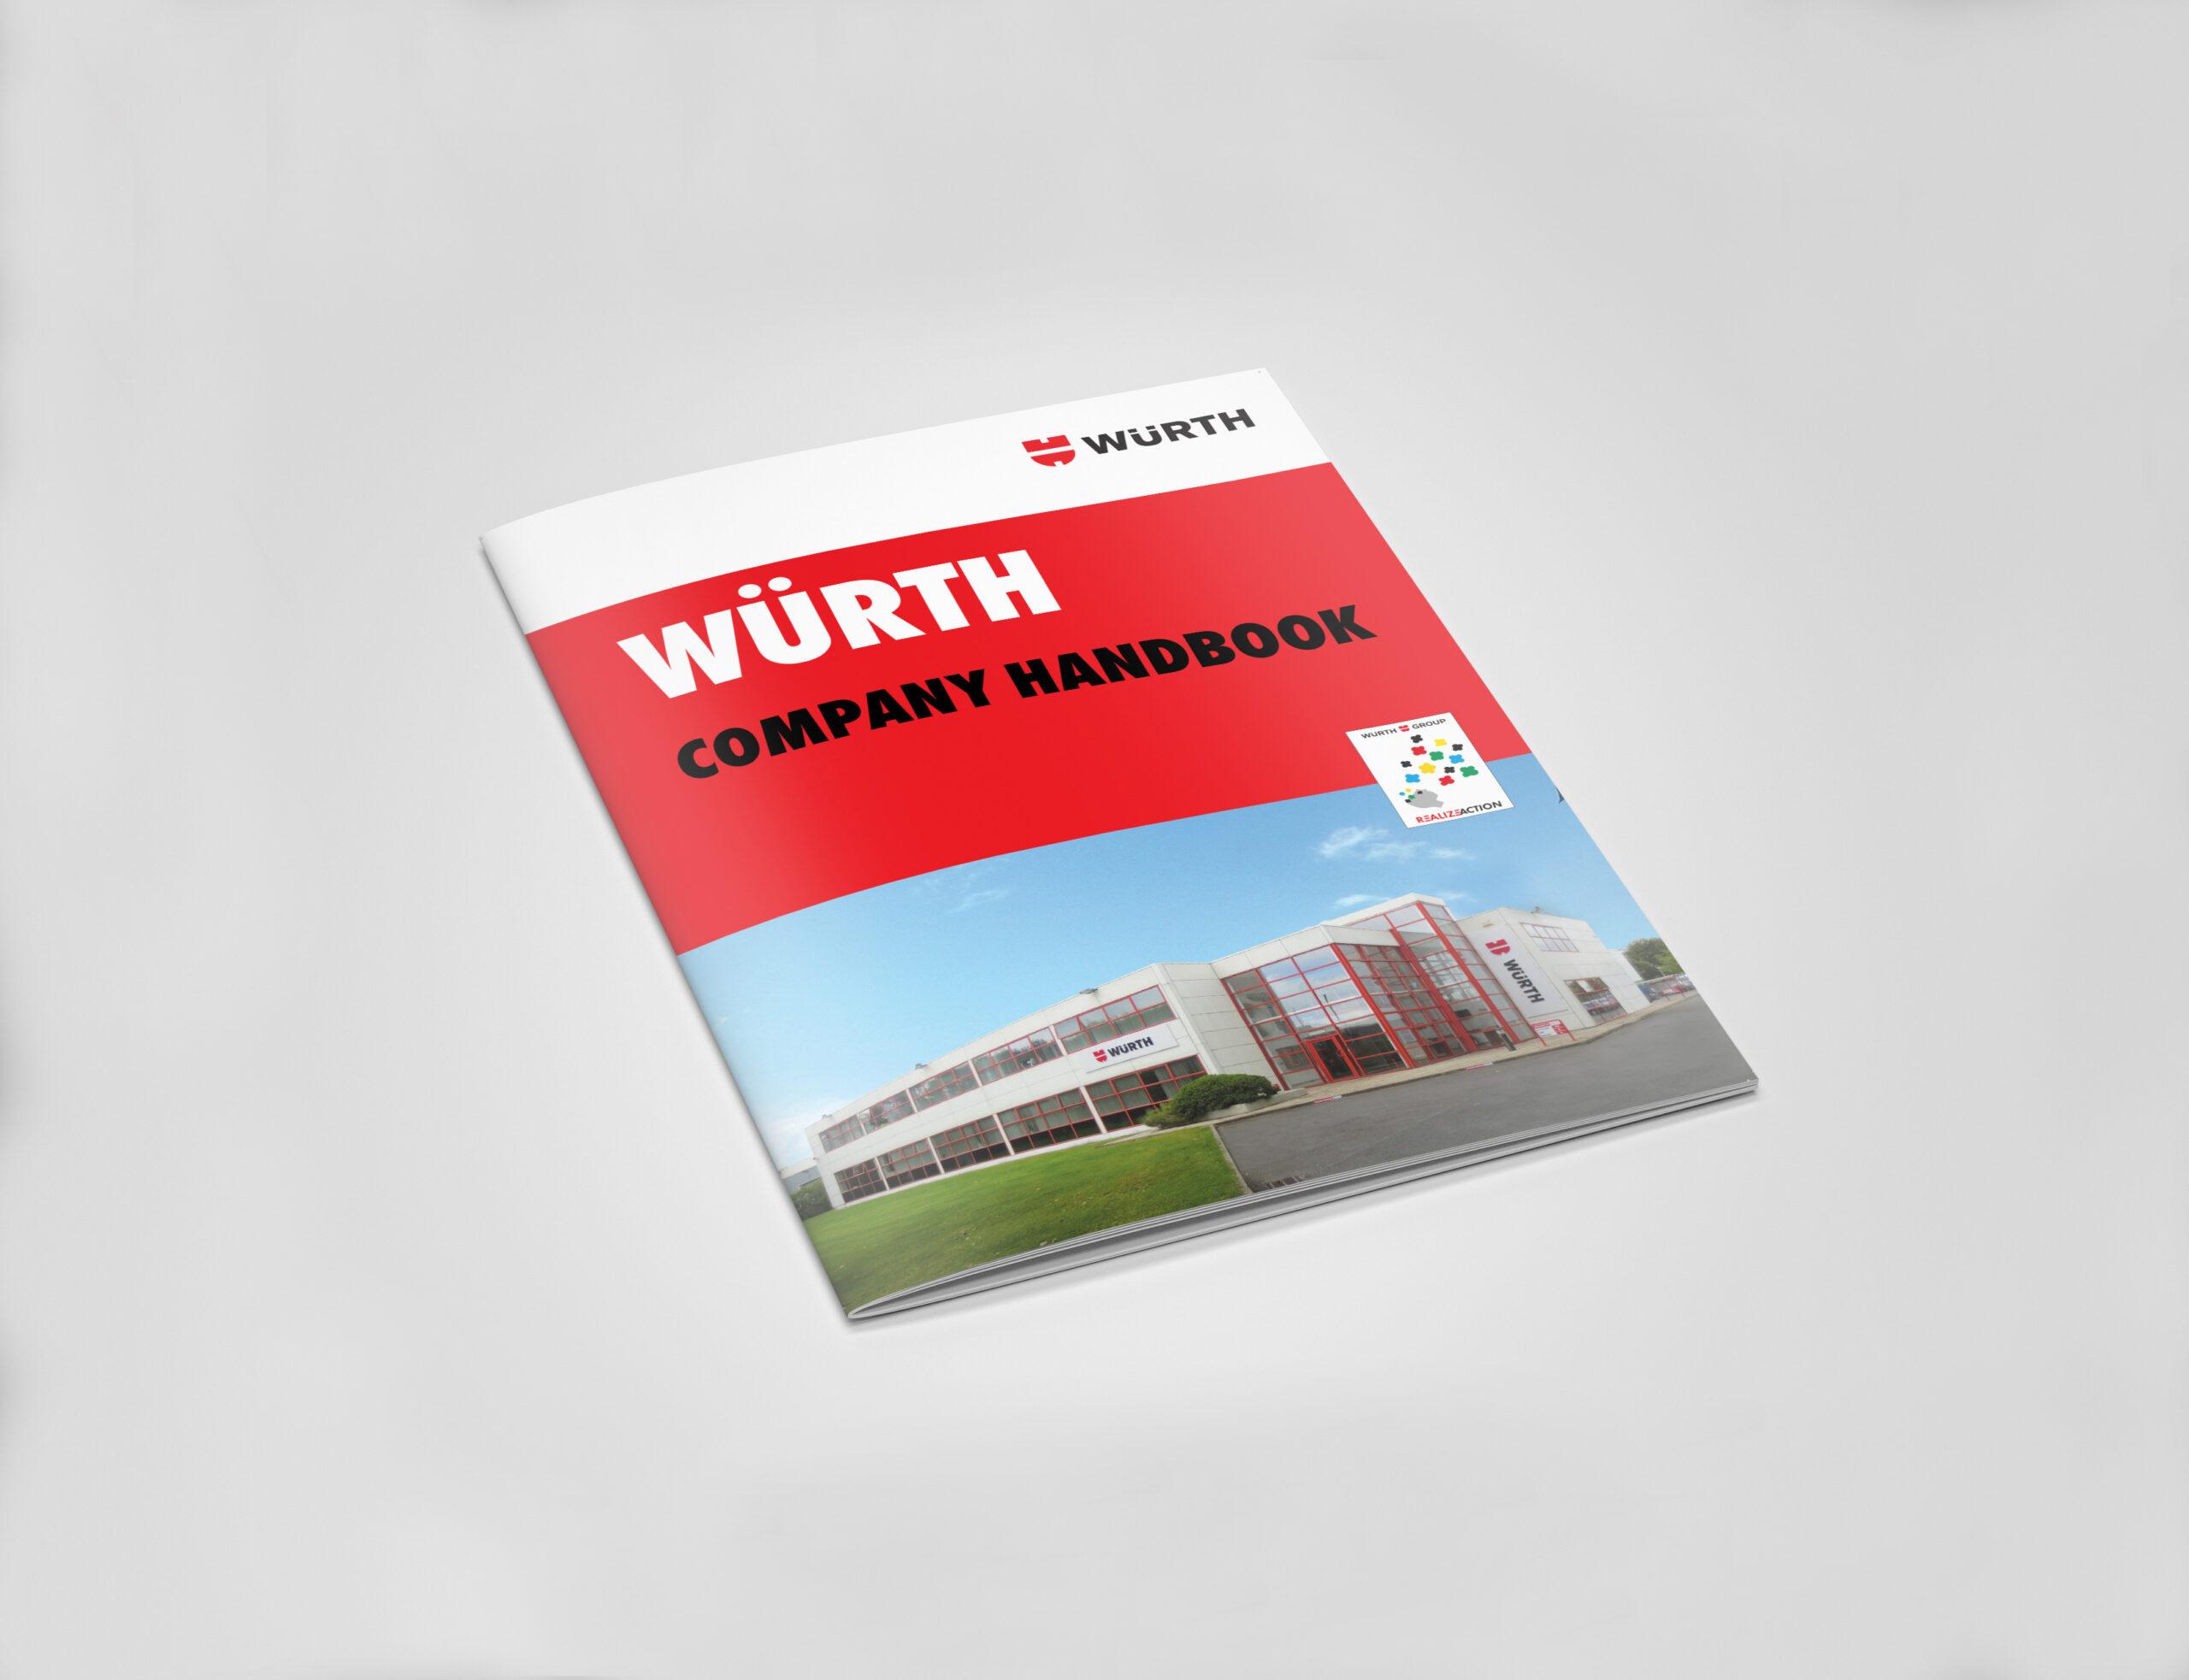 Wurth Handbook Cover